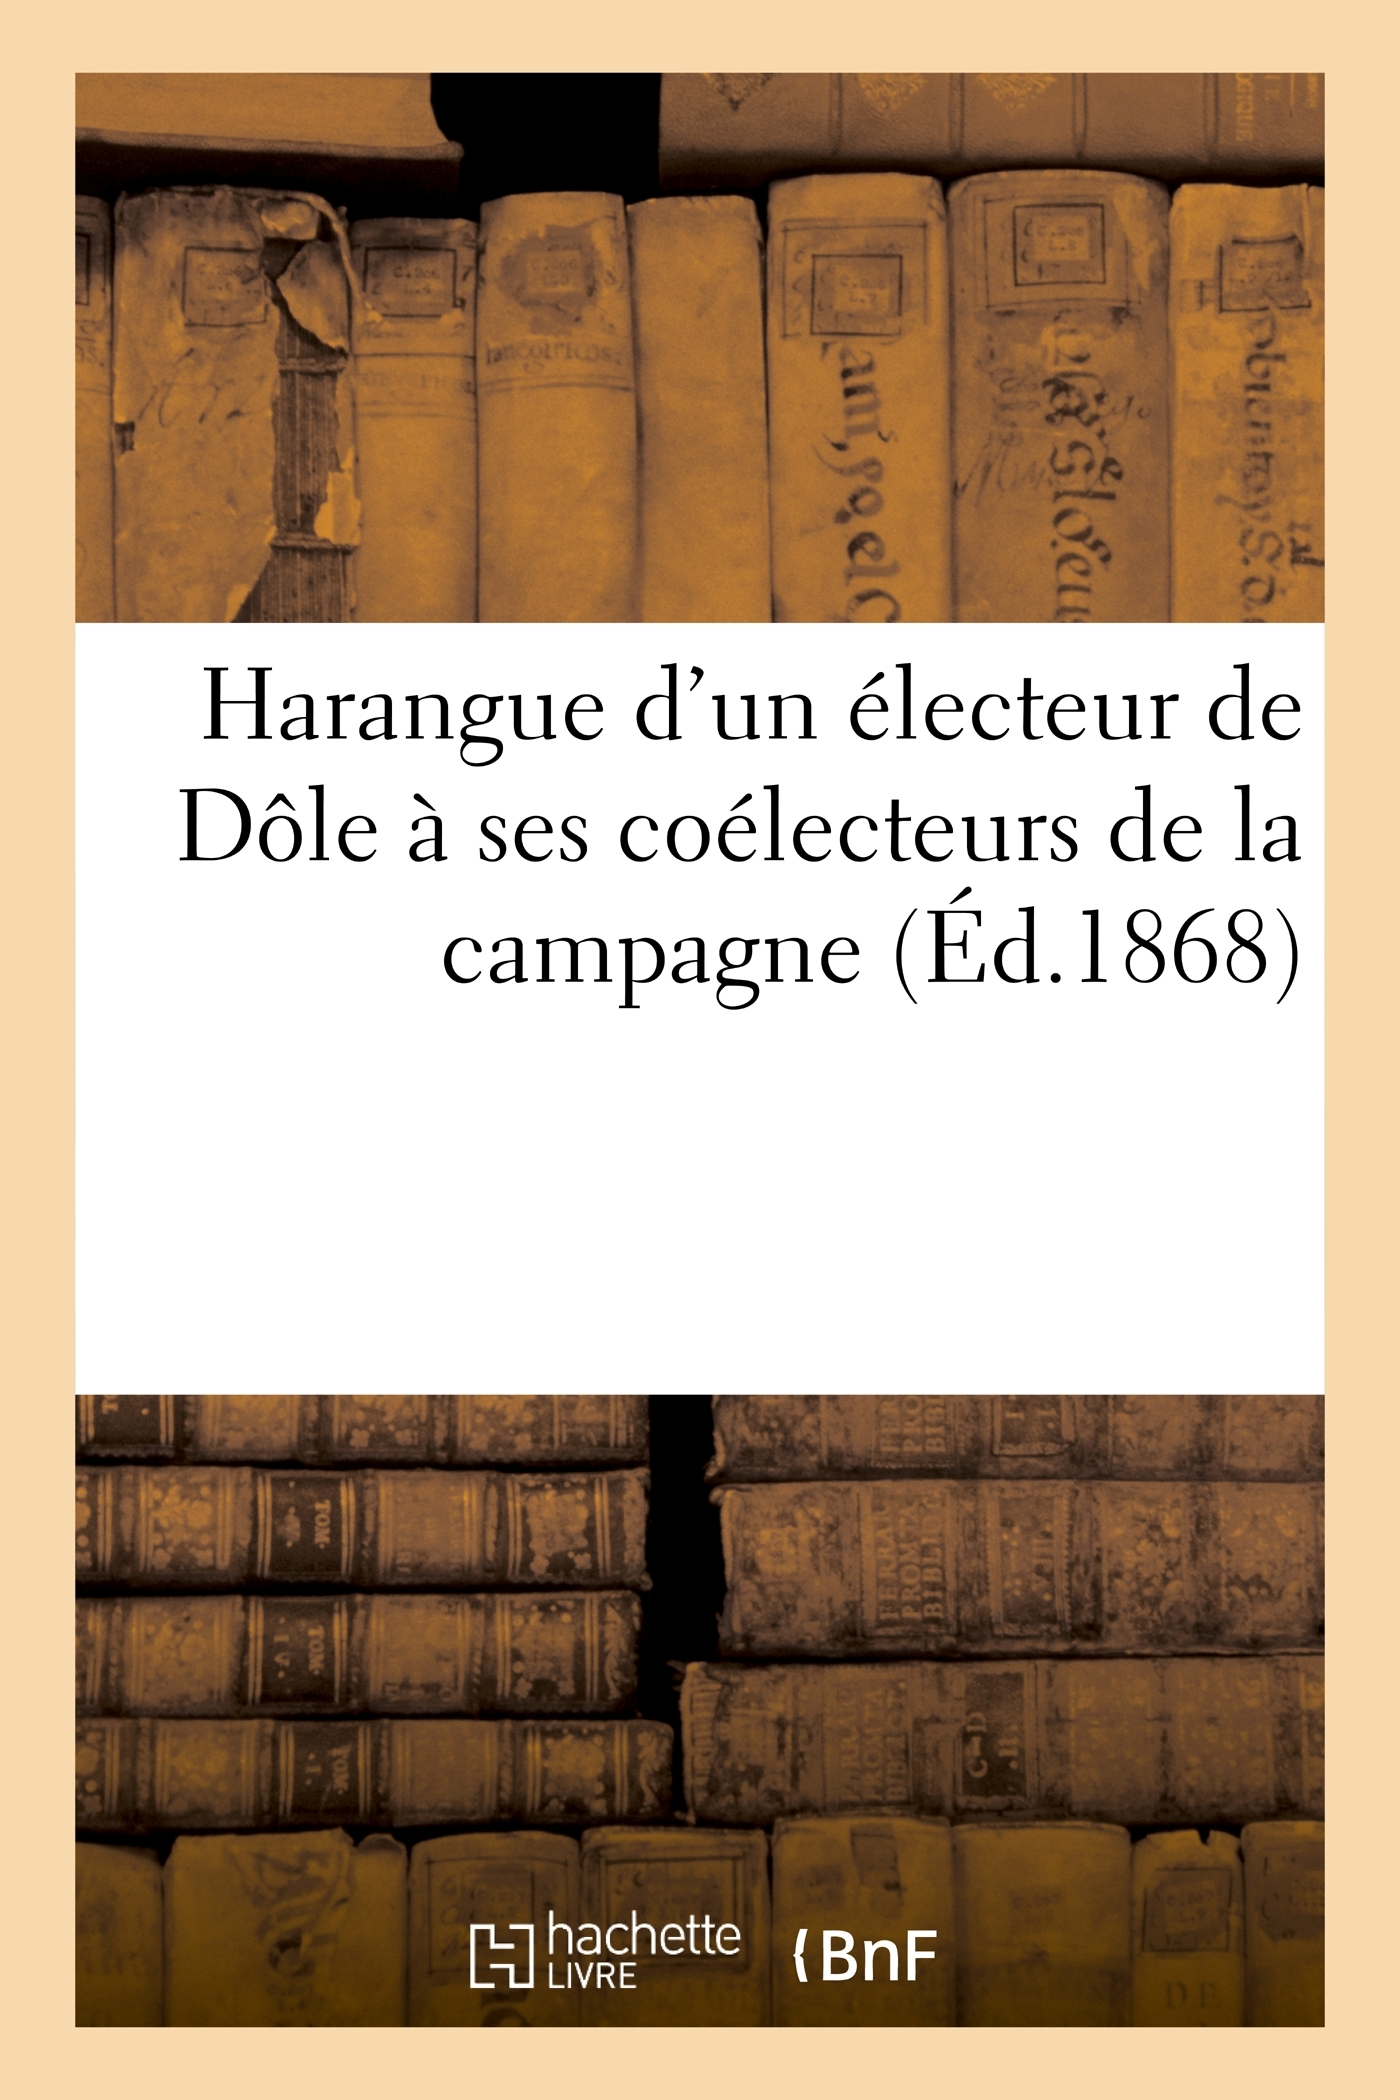 HARANGUE D'UN ELECTEUR DE DOLE A SES COELECTEURS DE LA CAMPAGNE